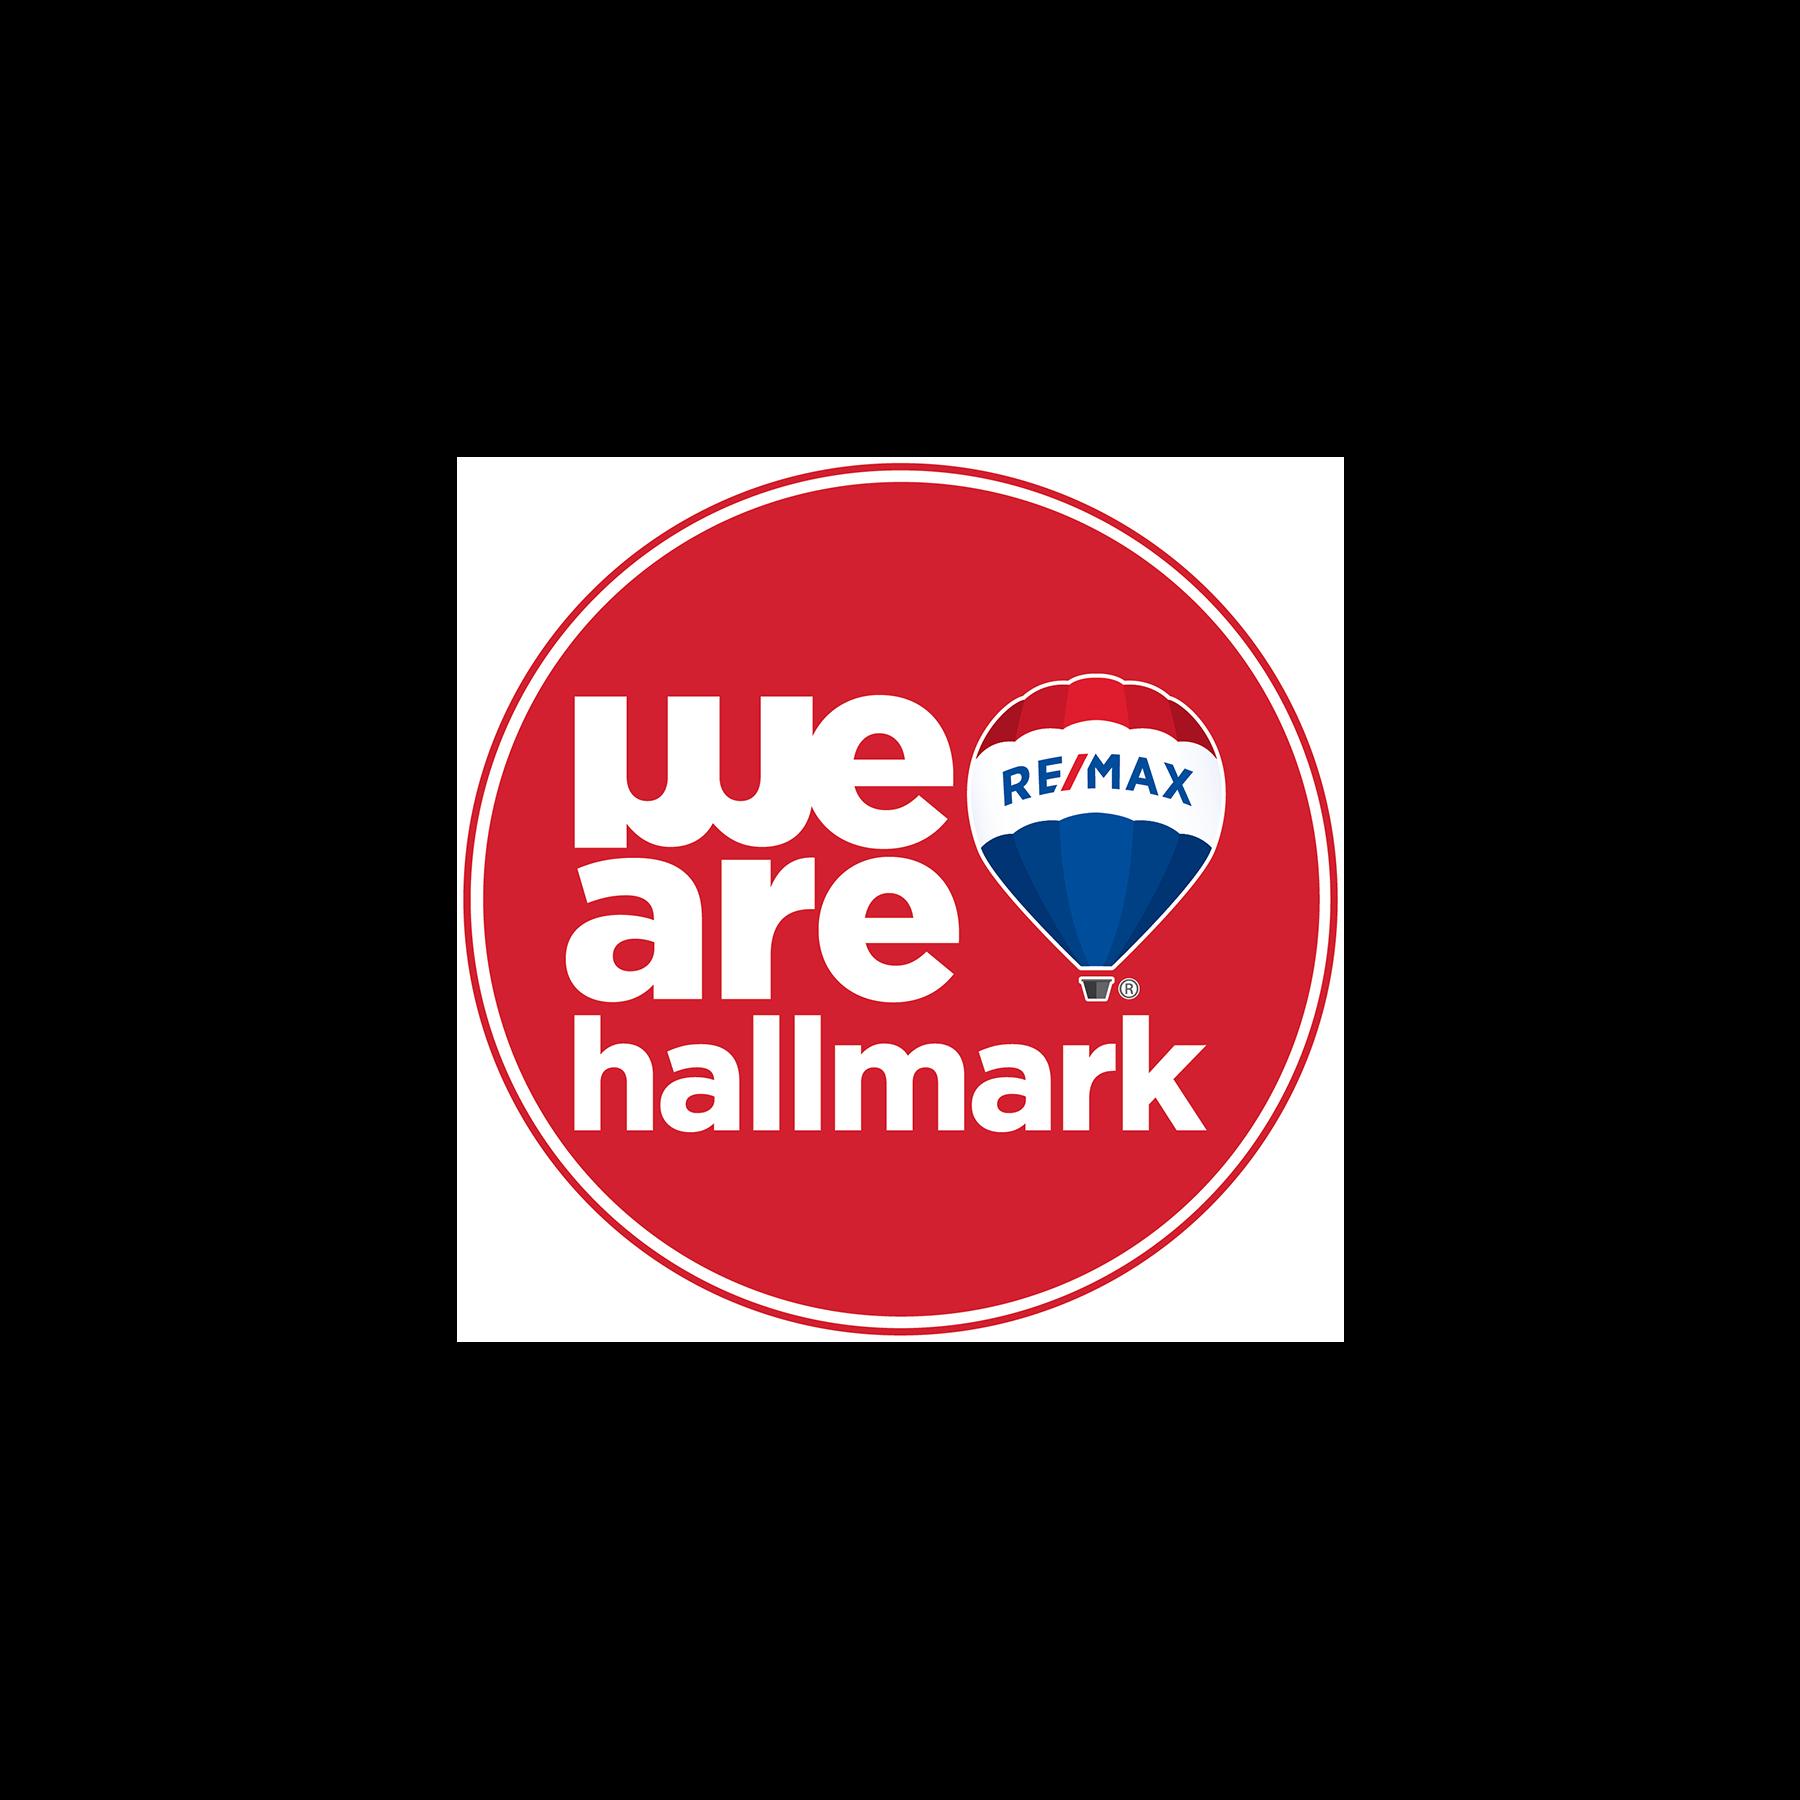 REMAX Hallmark Realty Ltd